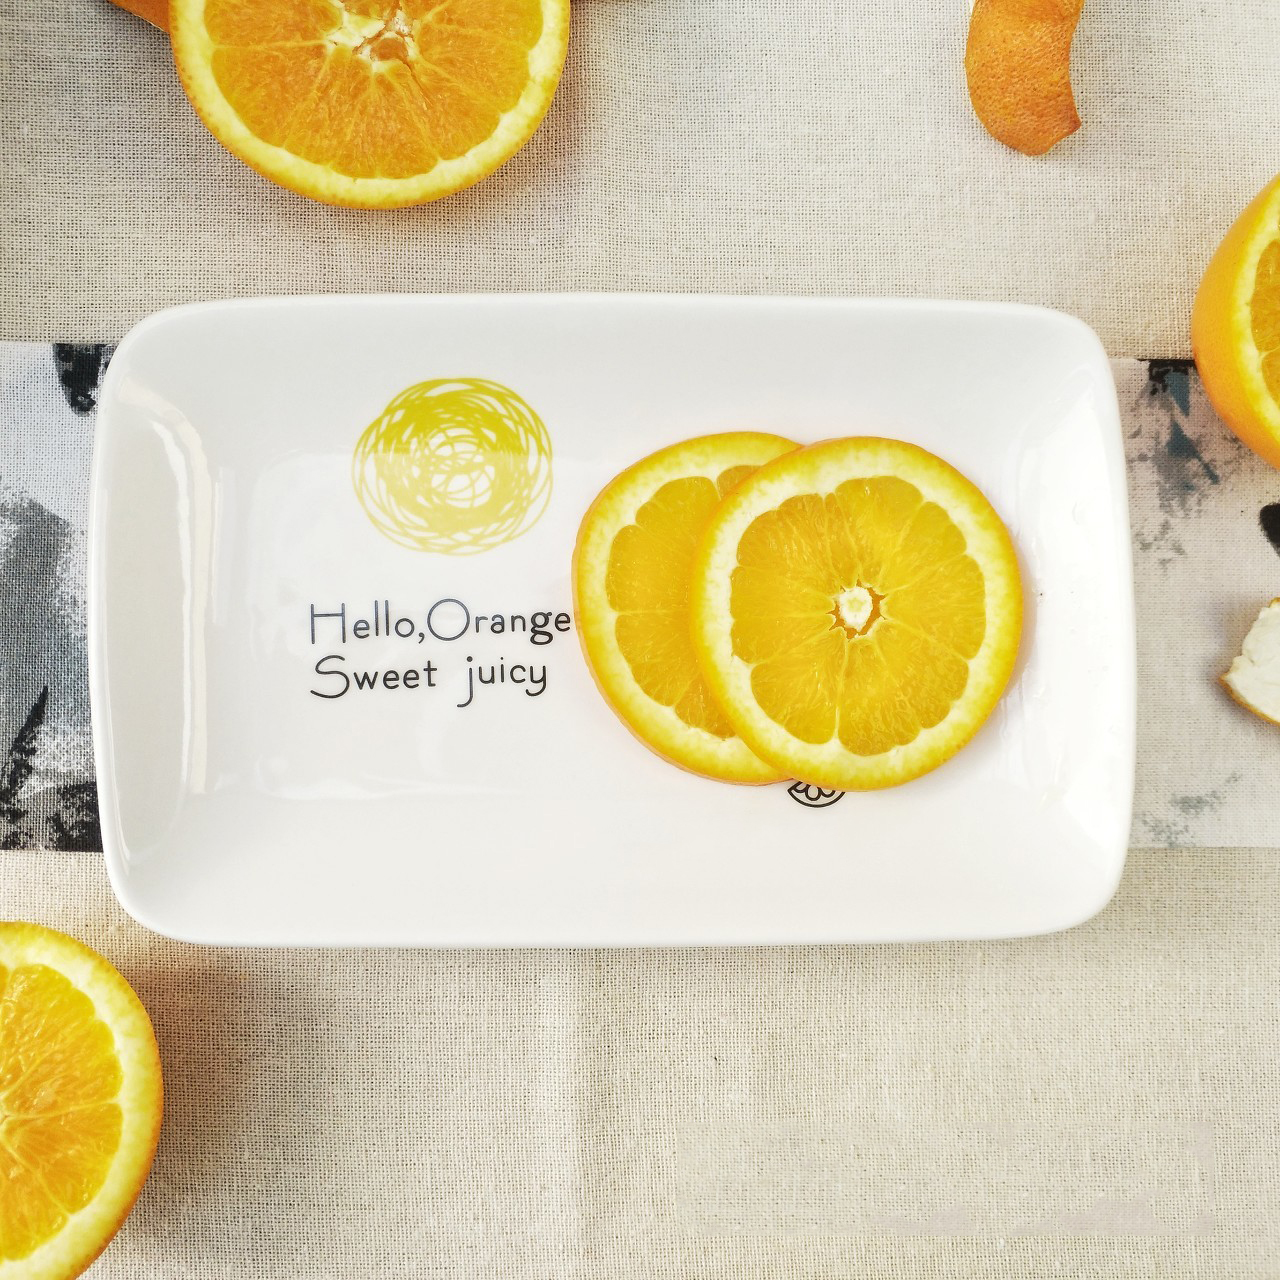 300W Lemon Citrus Juicer in Blender Stainless Steel Hand Pressed Household Electric Citrus Juicer Hand Orange 300W Lemon Citrus Juicer in Blender Stainless Steel Hand Pressed Household Electric Citrus Juicer Hand Orange Squeezer Sonifer